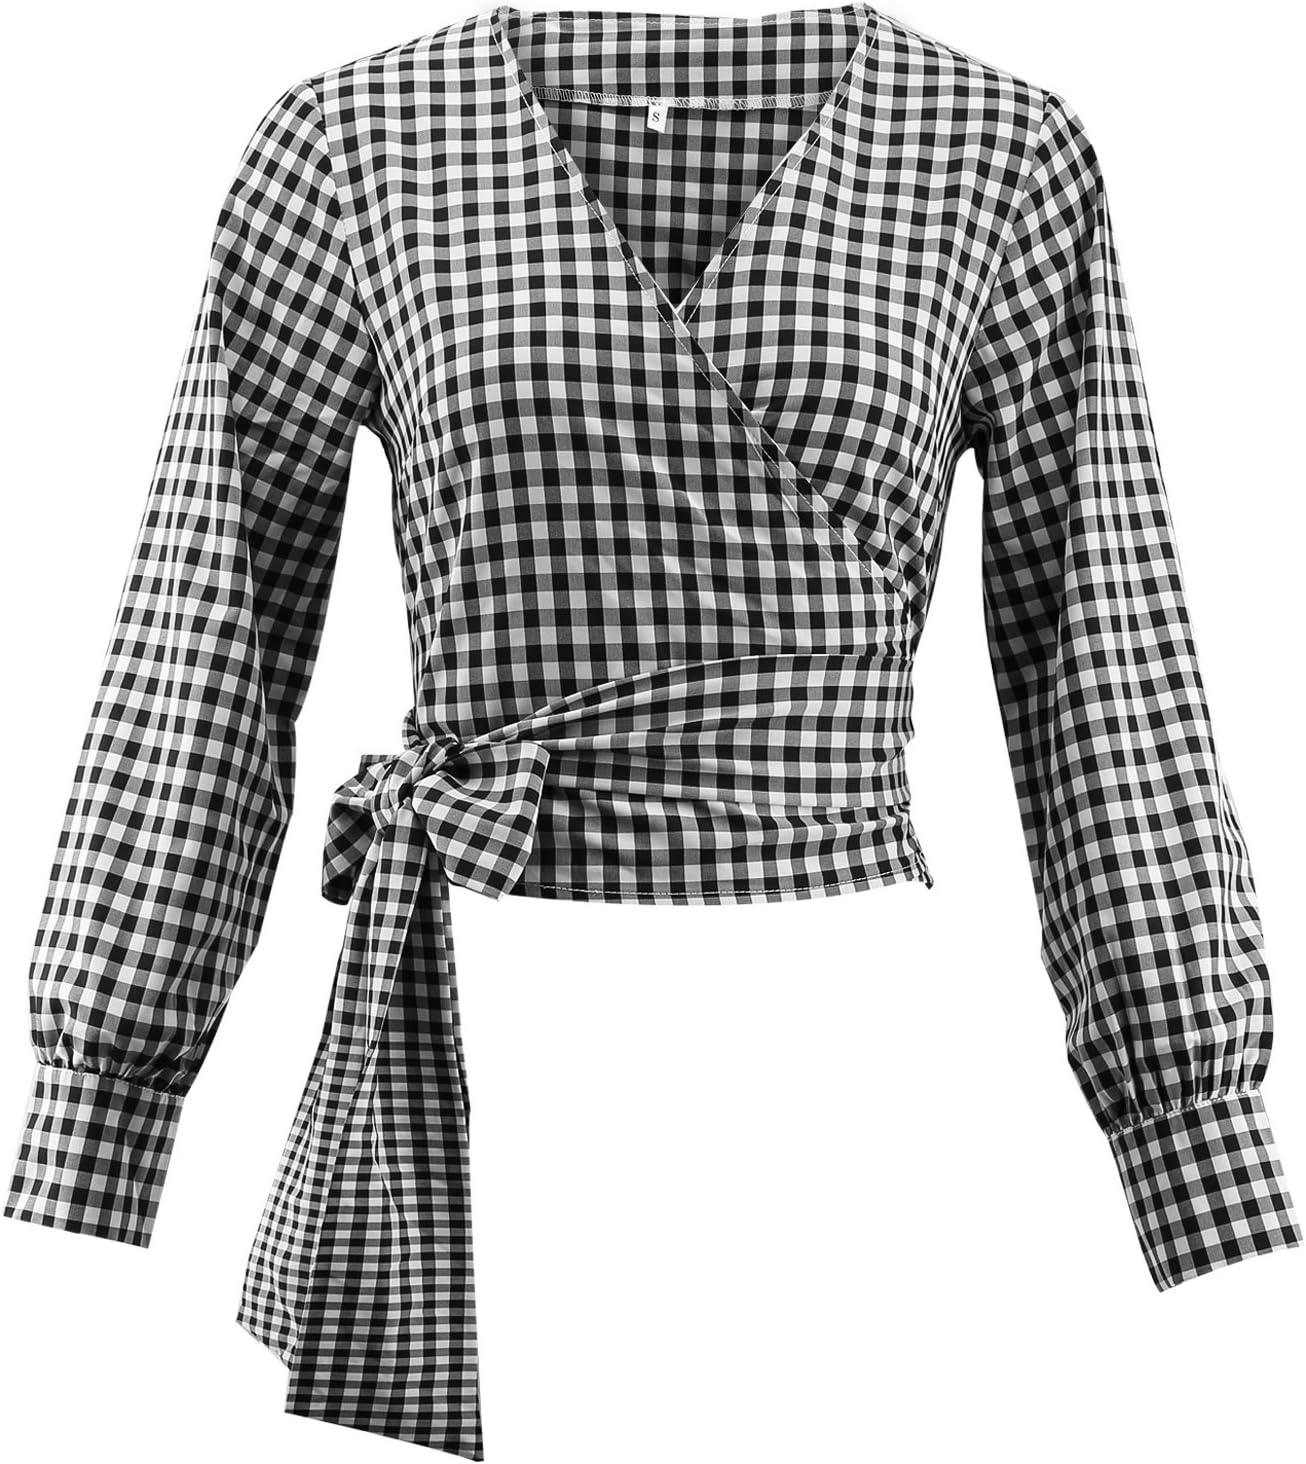 Luxspire Mujer Camiseta Blusa Casual Parent